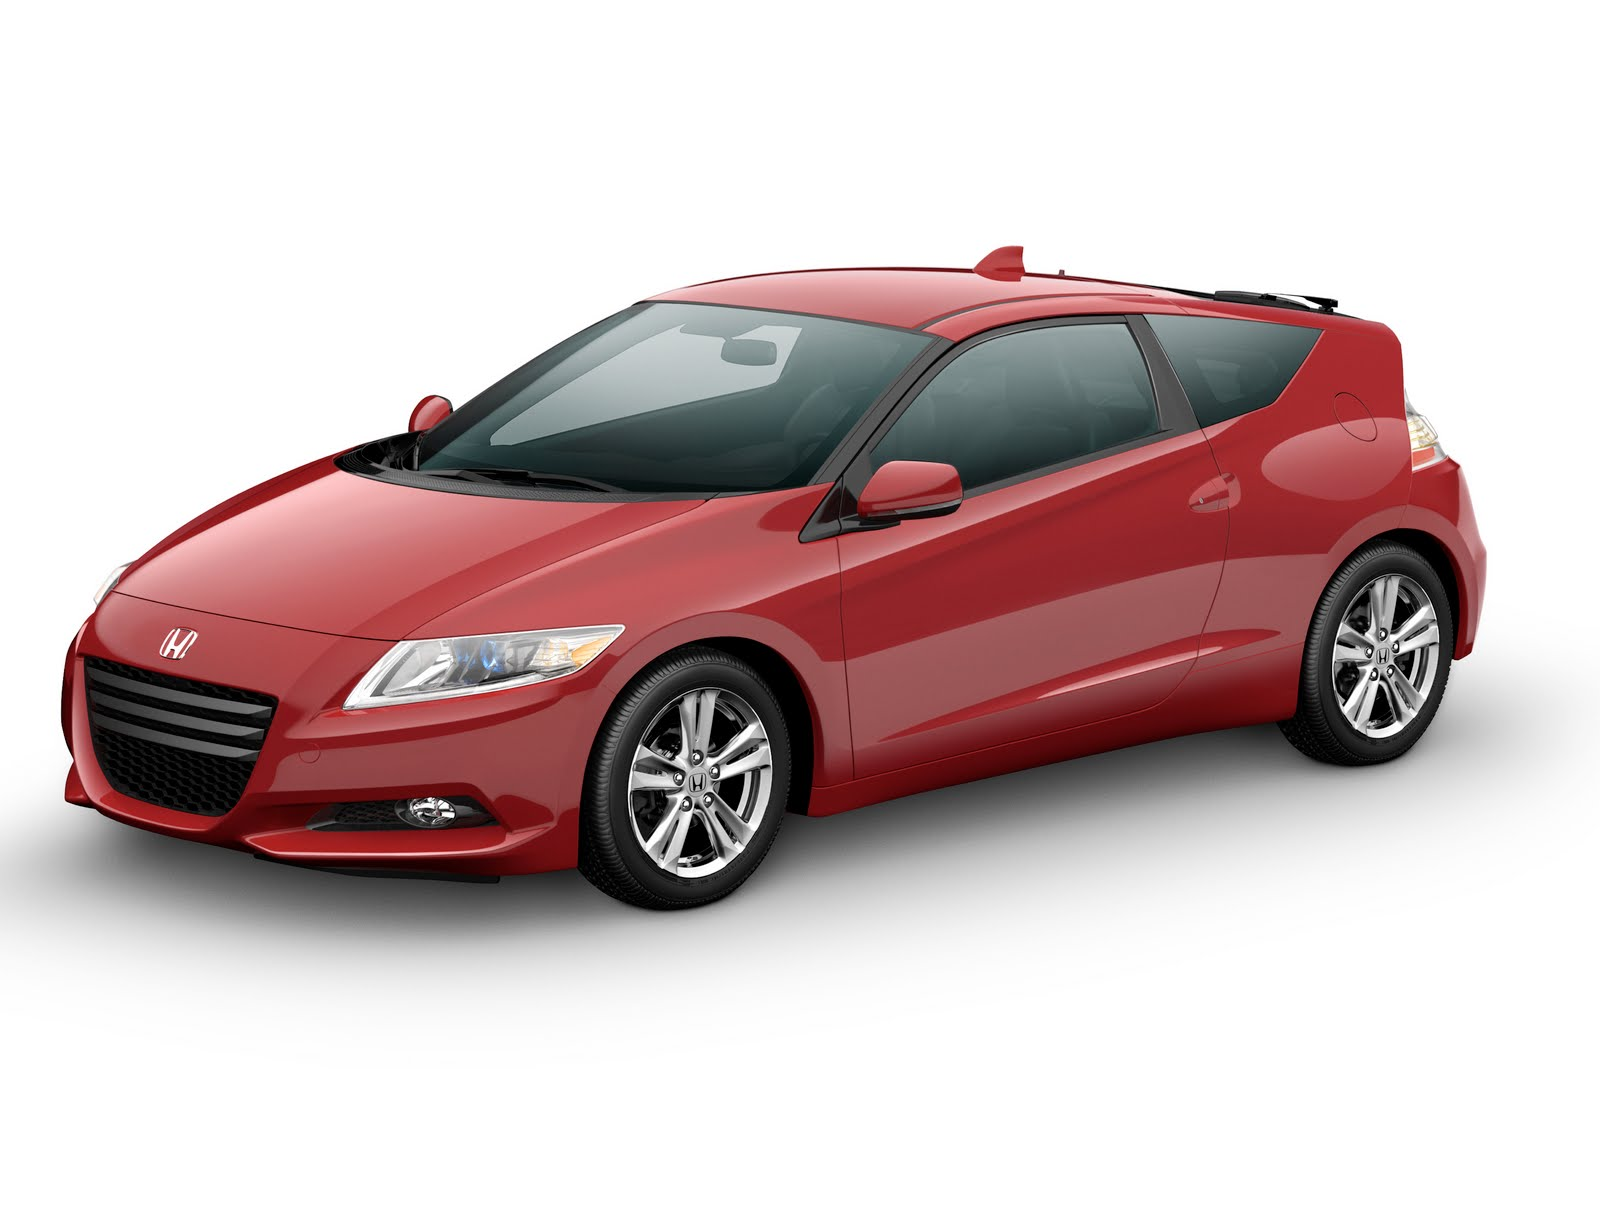 auto cars new 2011 - photo #5